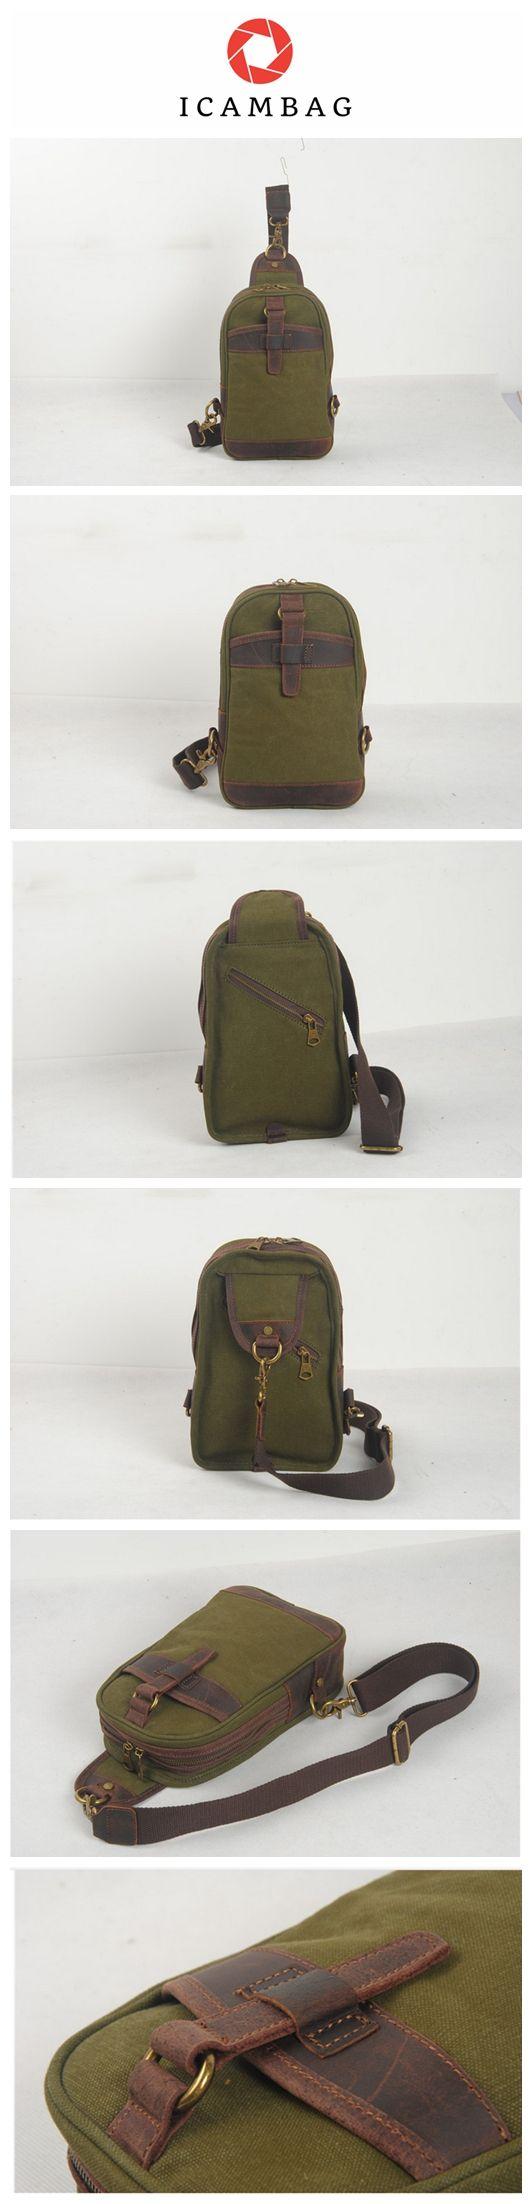 Canvas bag single shoulder cross-handbag breast bag men and women's satchel  1946